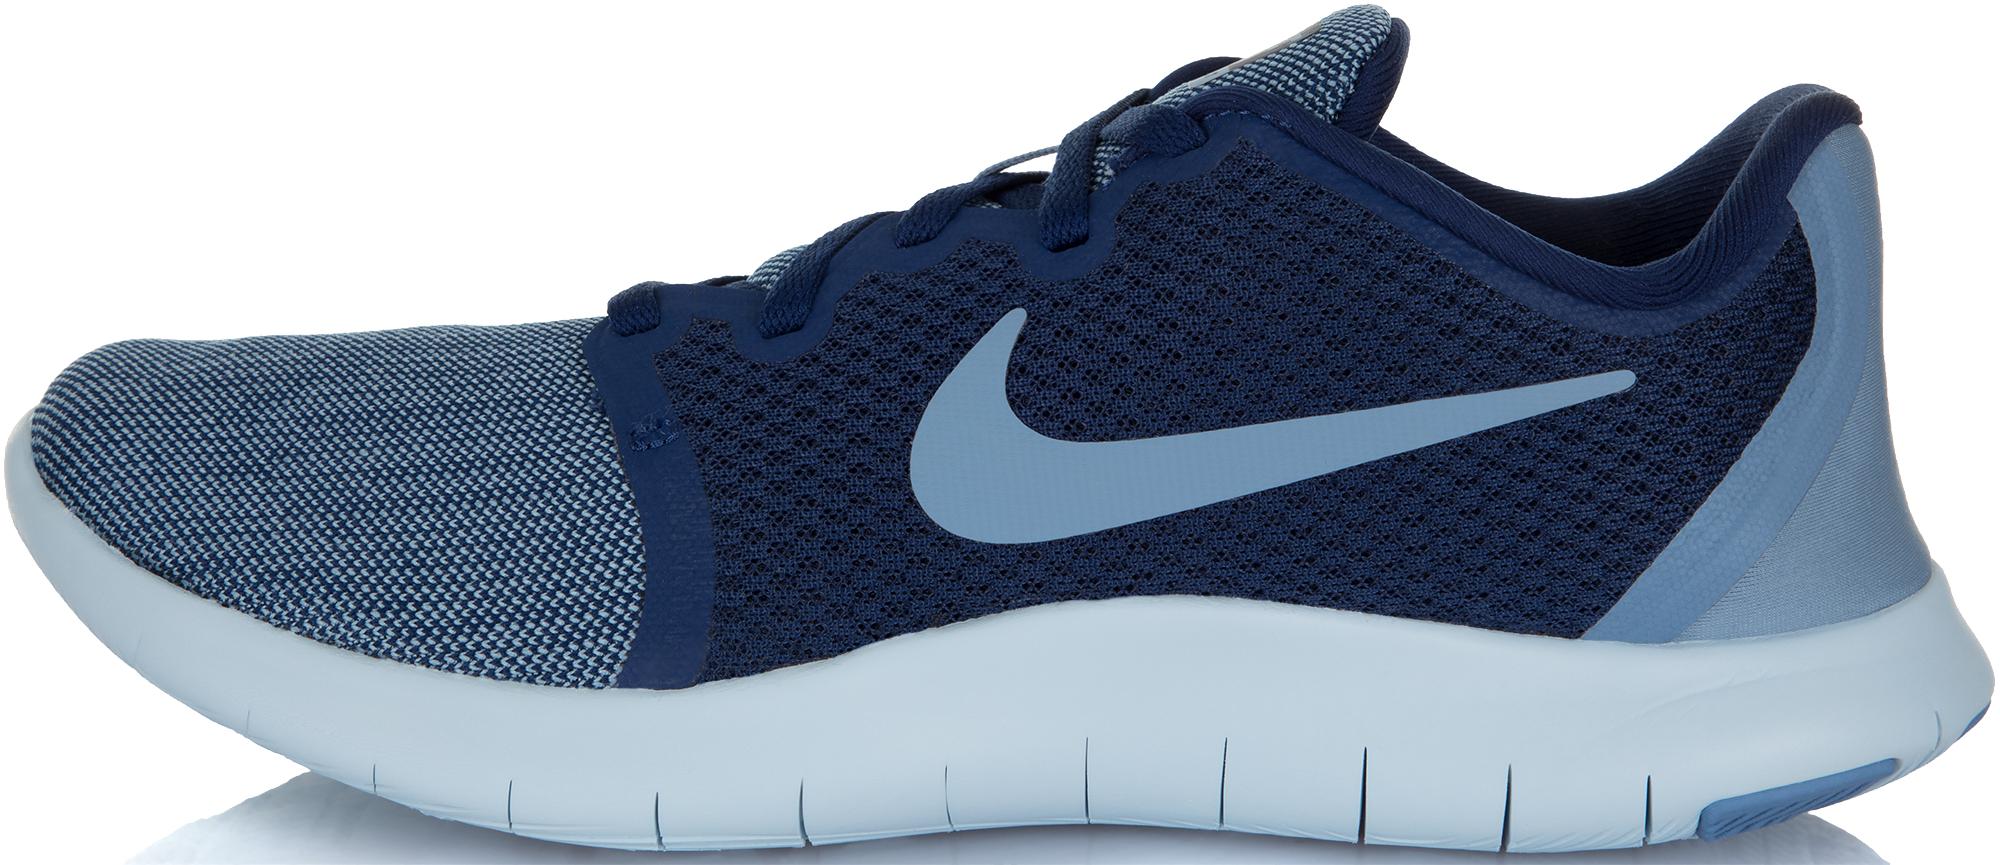 Nike Кроссовки женские Nike Flex Contact 2, размер 37,5